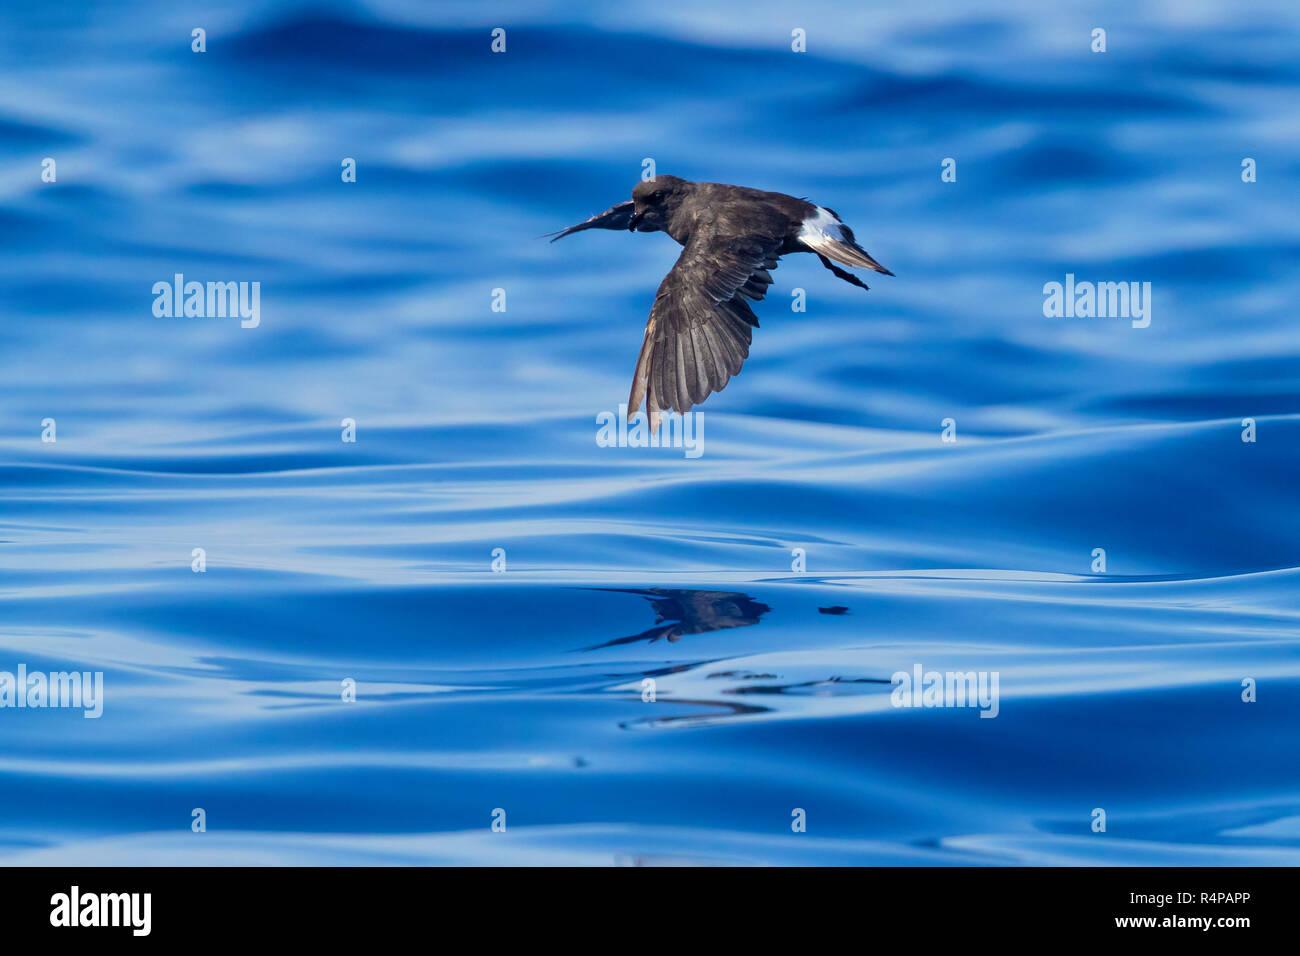 European Storm Petrel (Hydrobates pelagicus melitensis), individual in flight over the sea - Stock Image